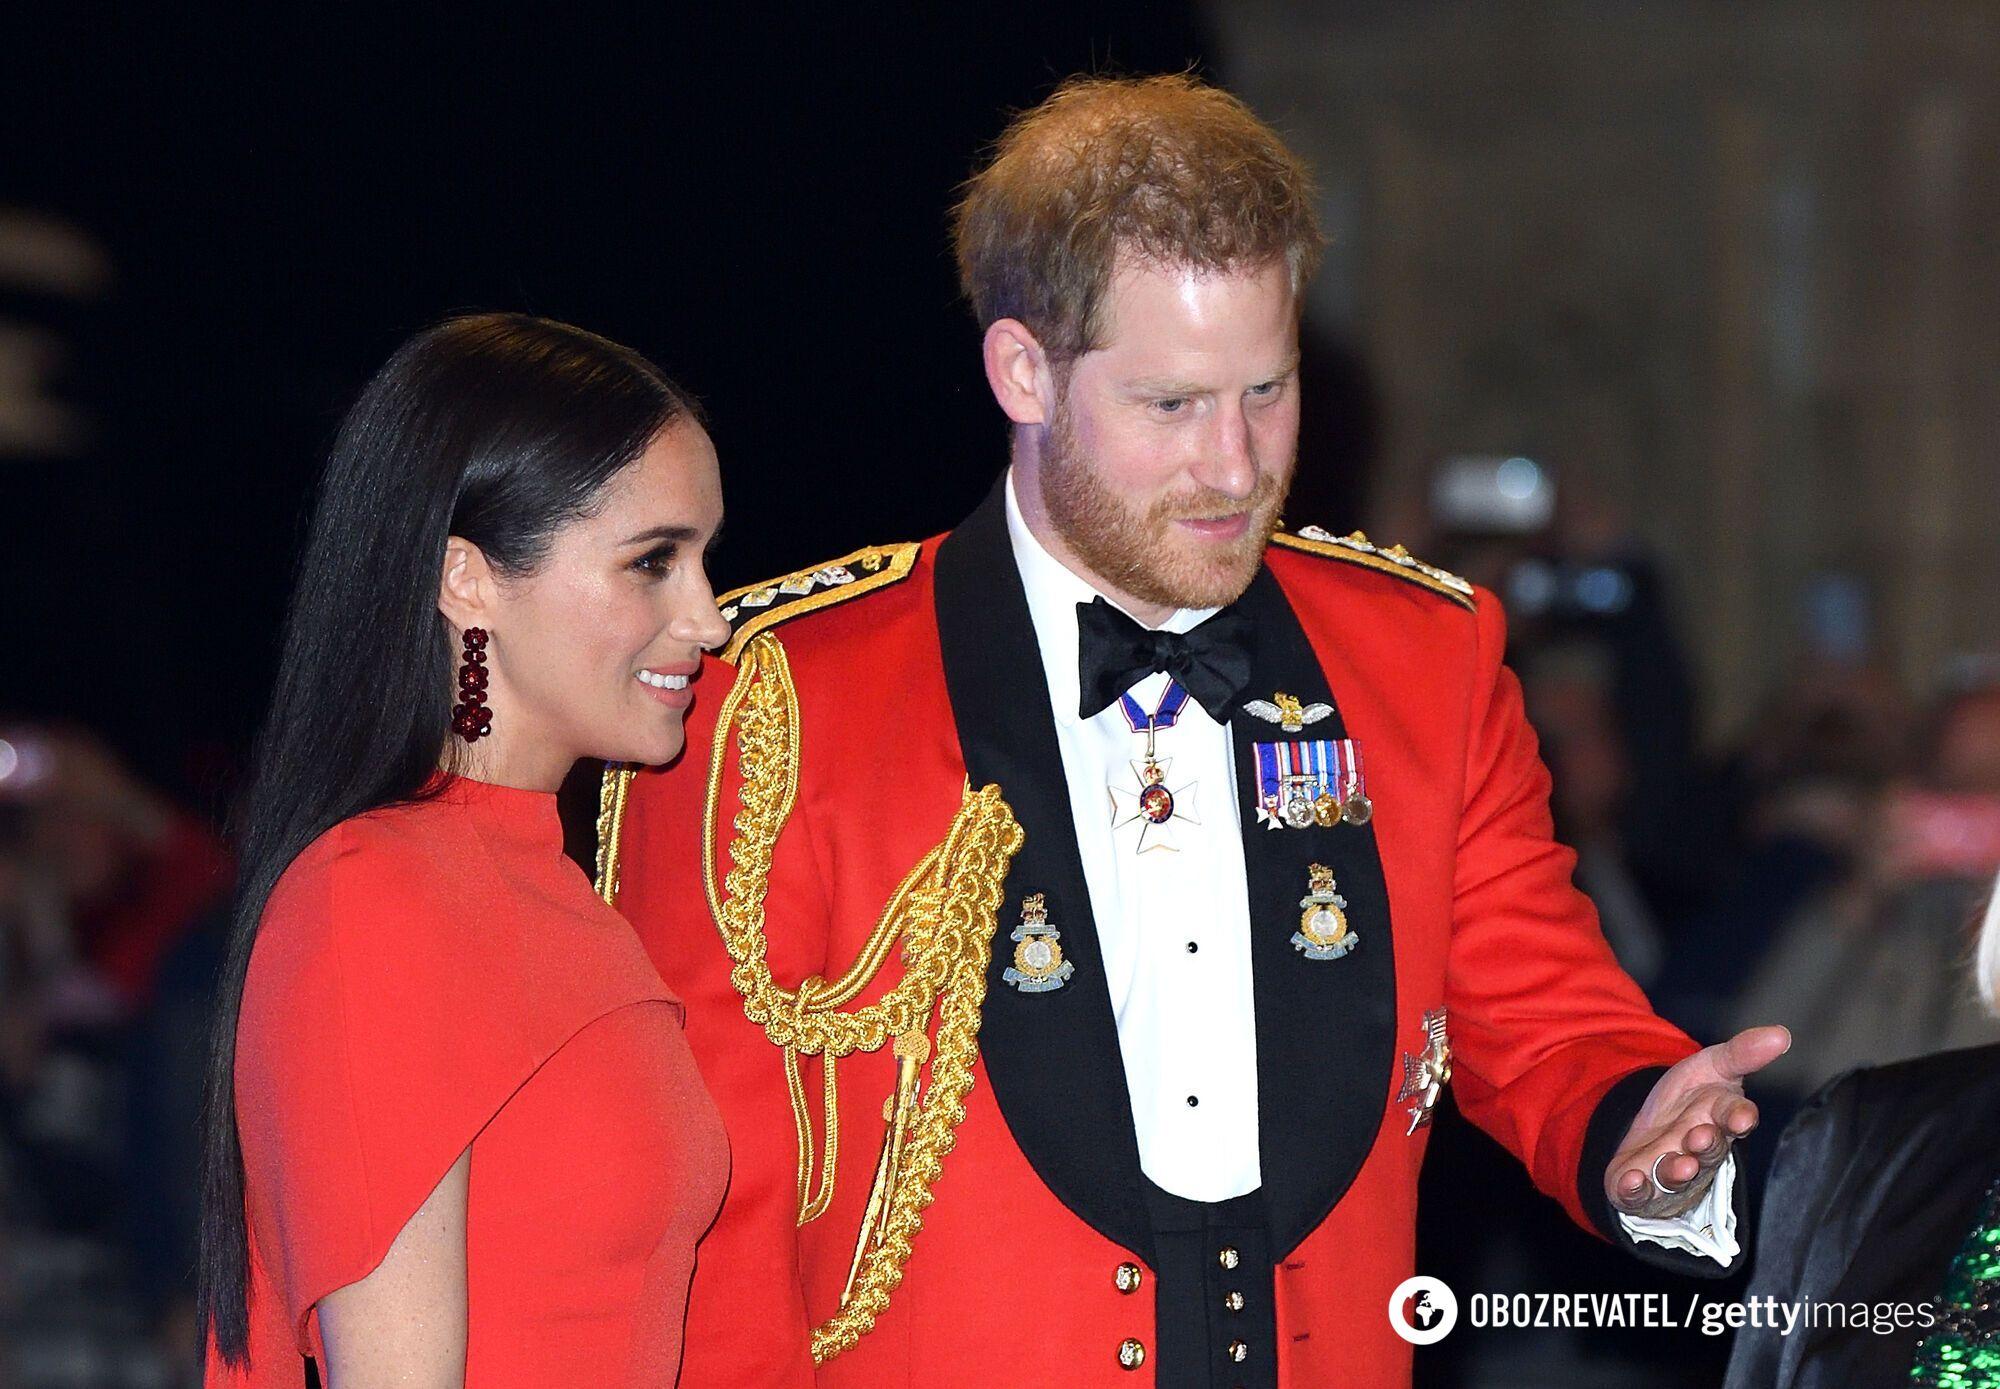 В сети бурно обсуждают принца Гарри и Меган Маркл